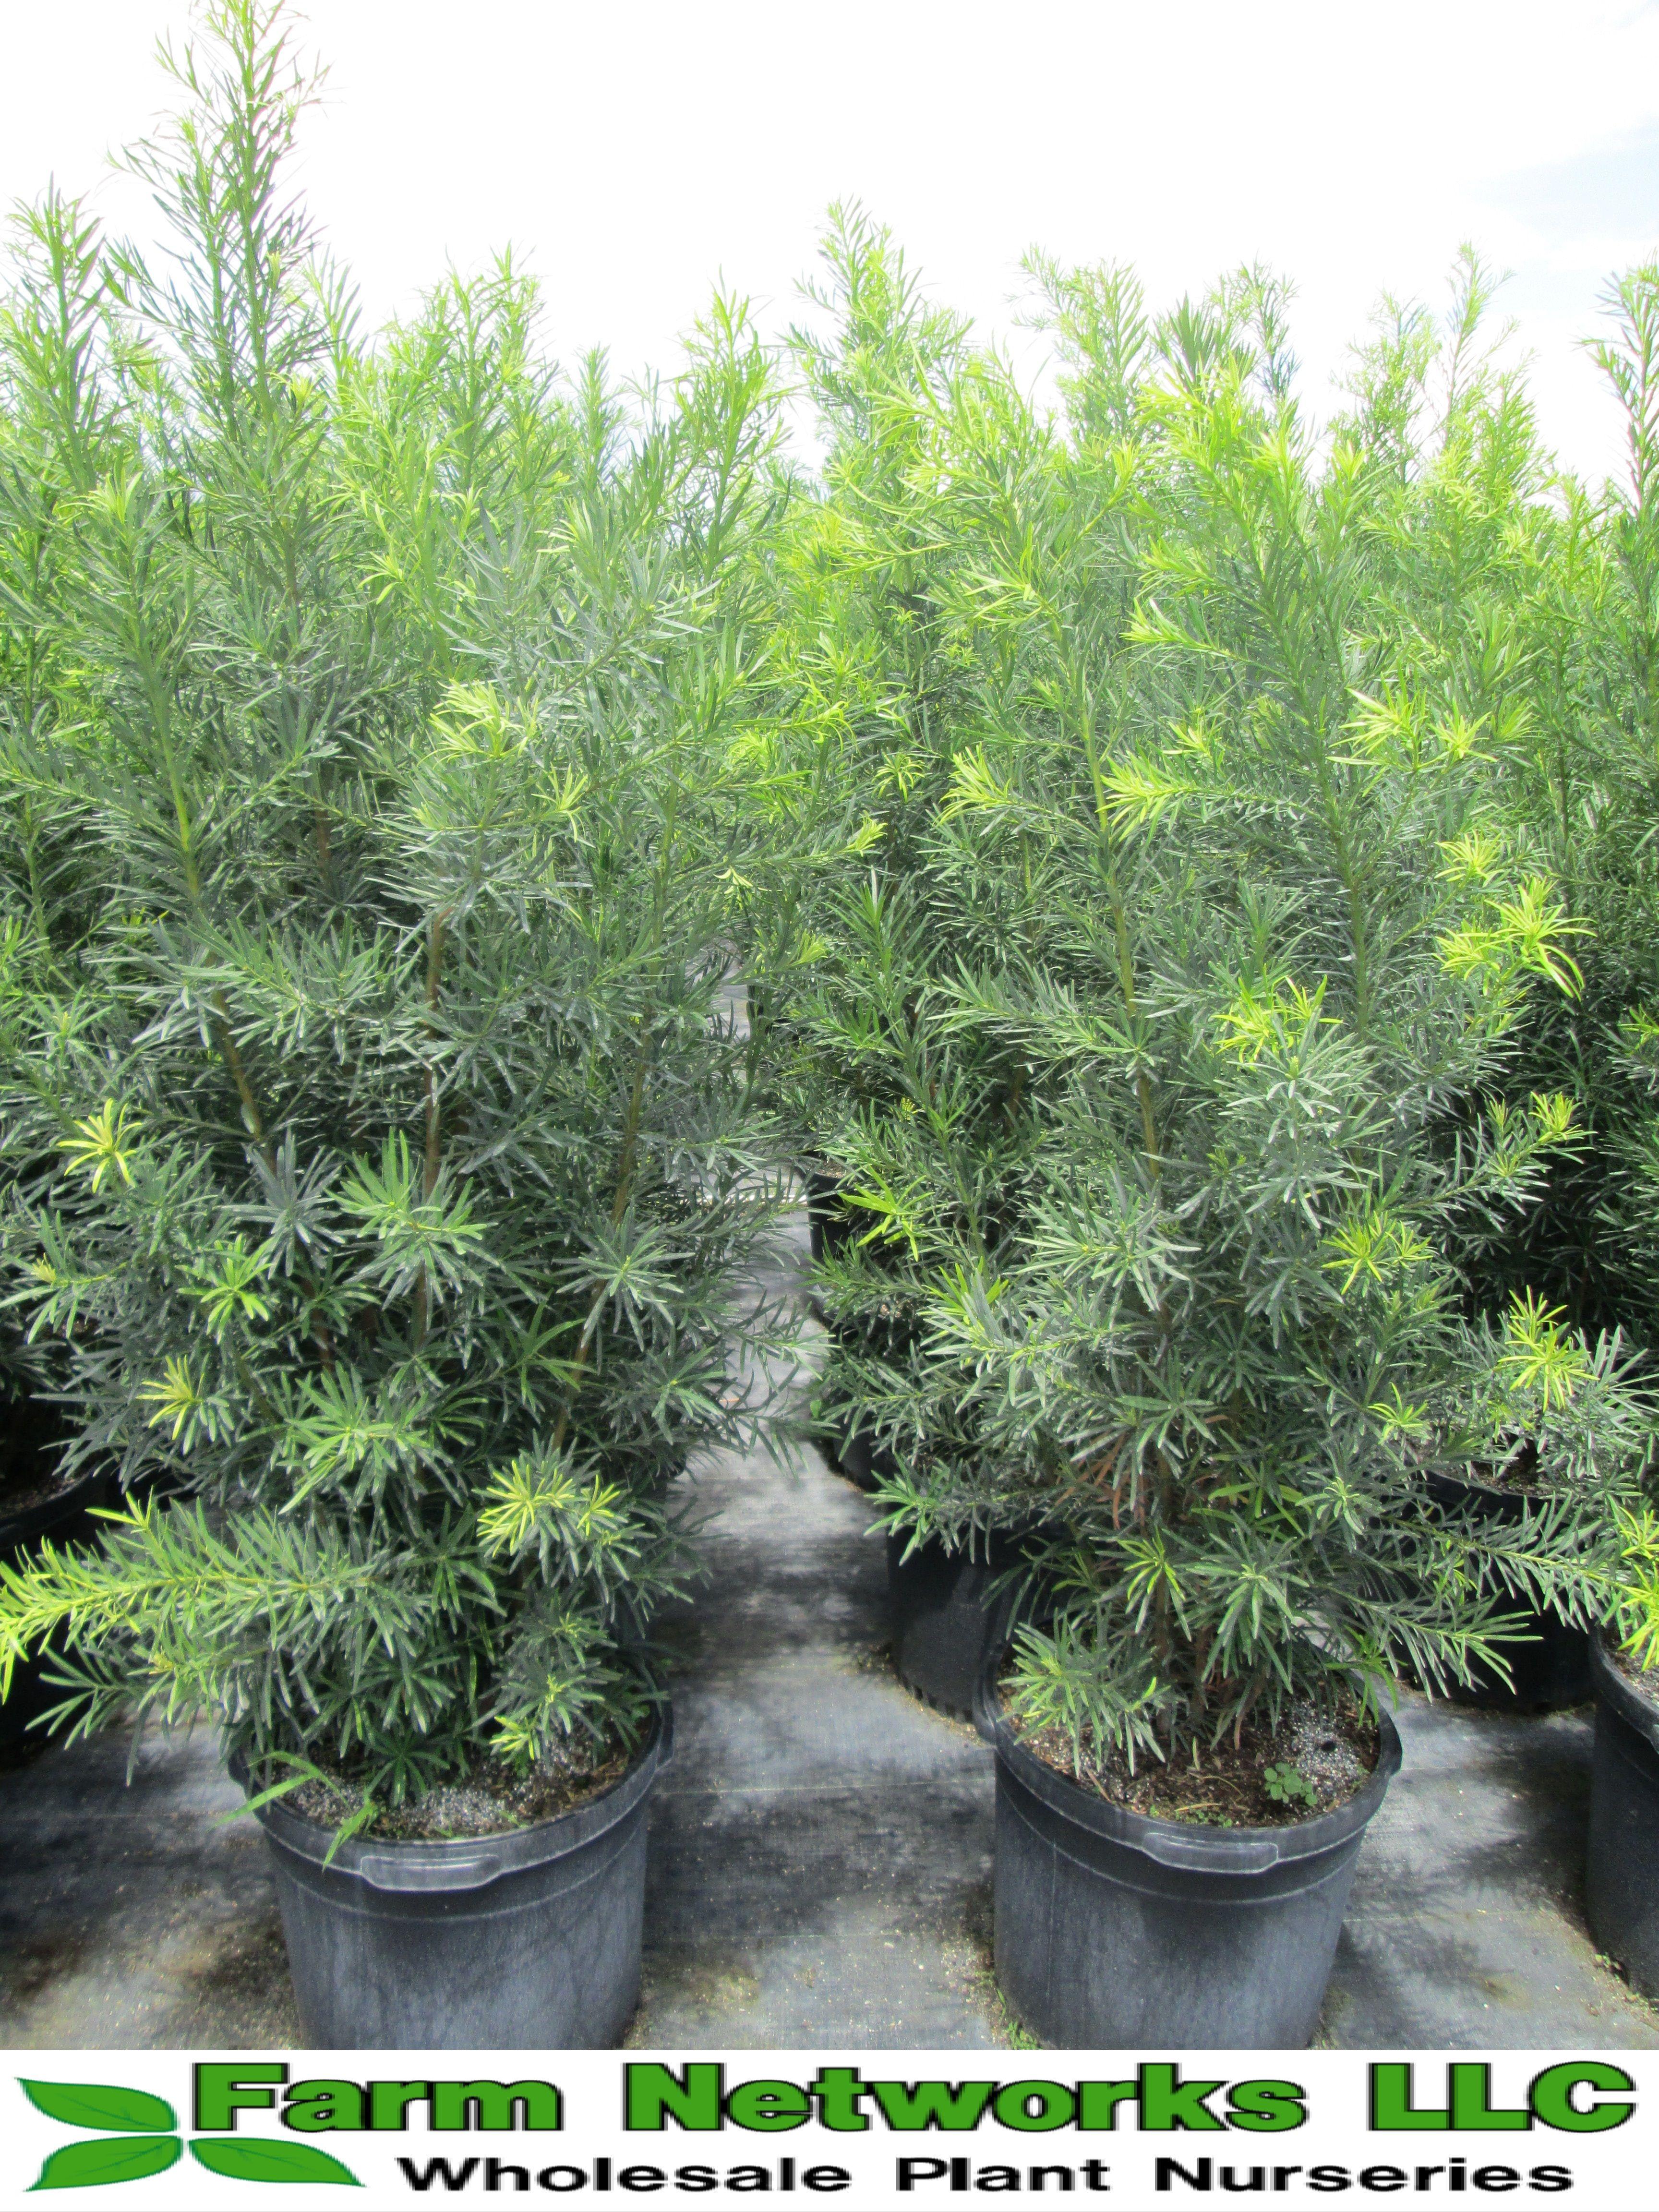 Miami Podocarpus Podocarpus Plant Podocarpus Podocarpus